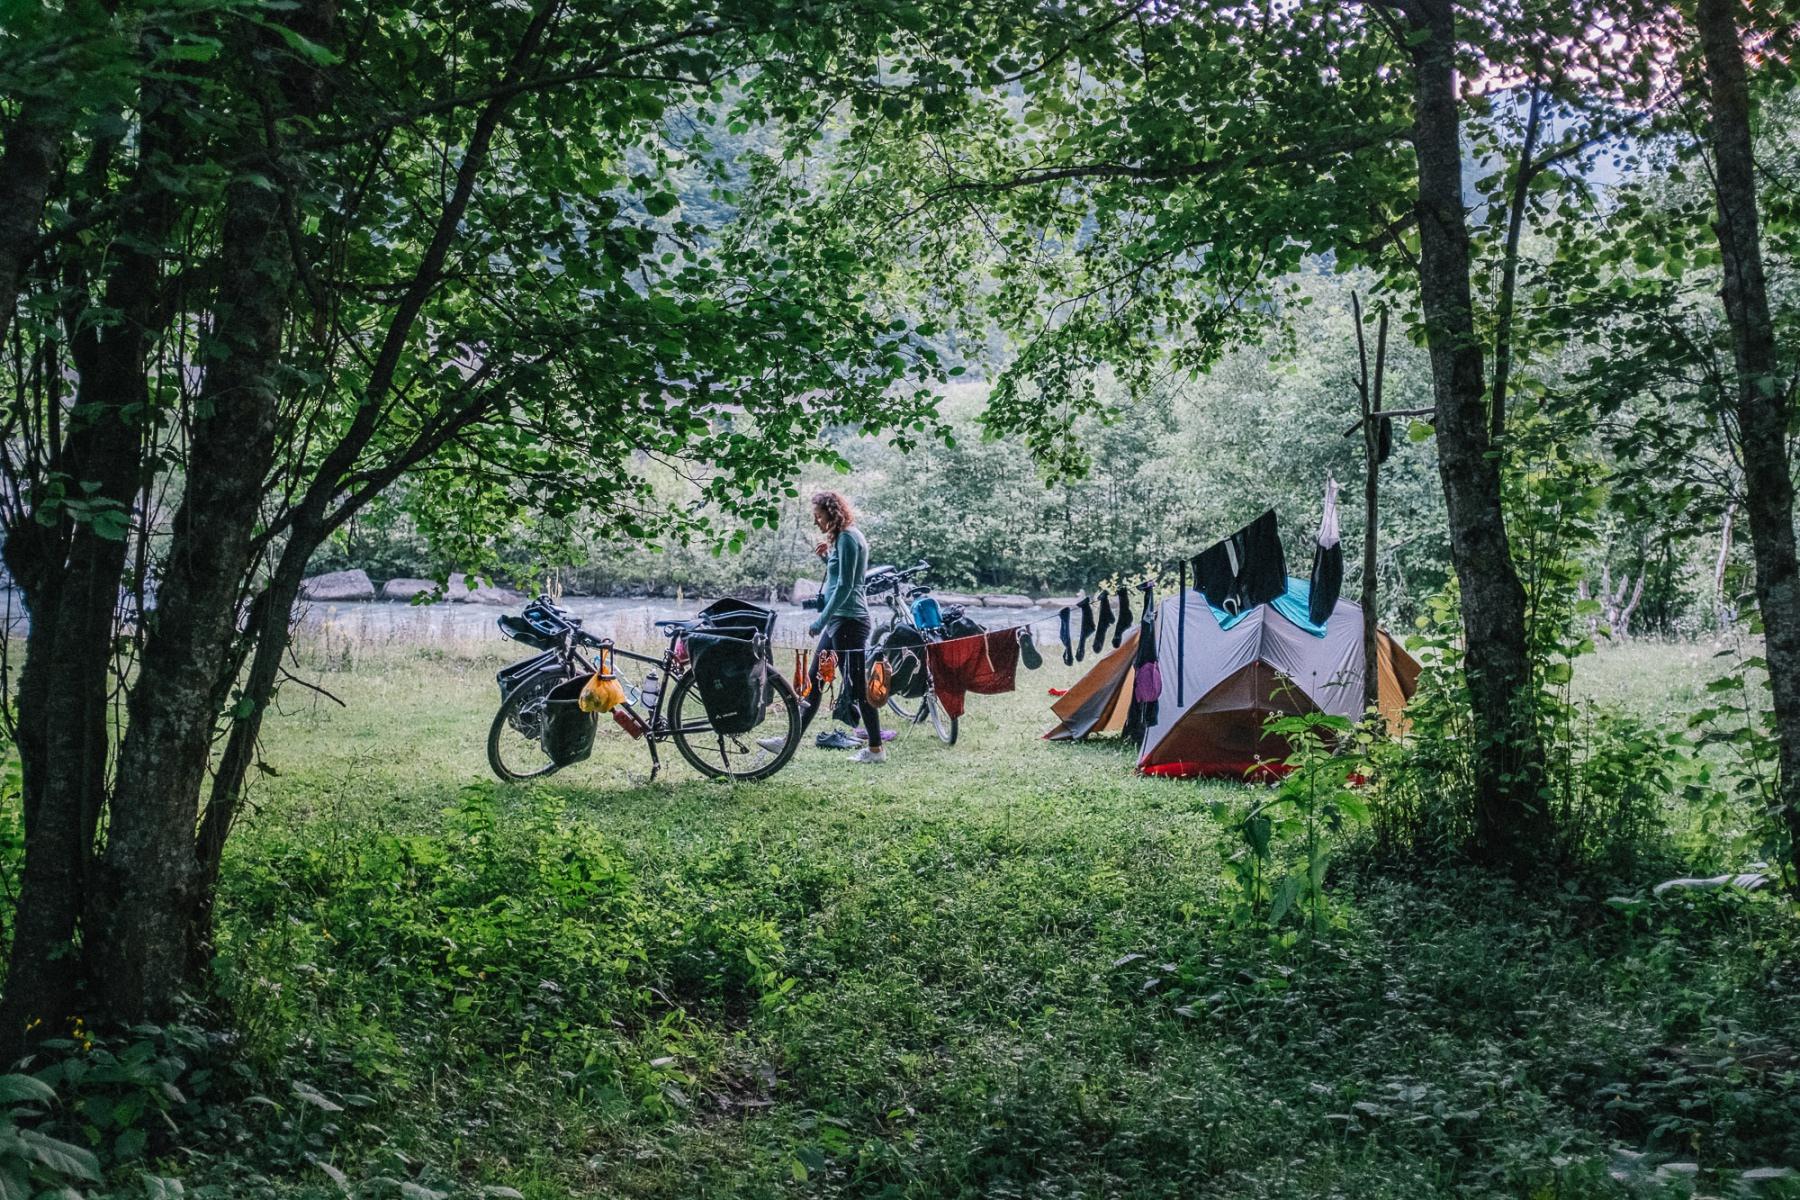 Camping in Korsha, Georgia